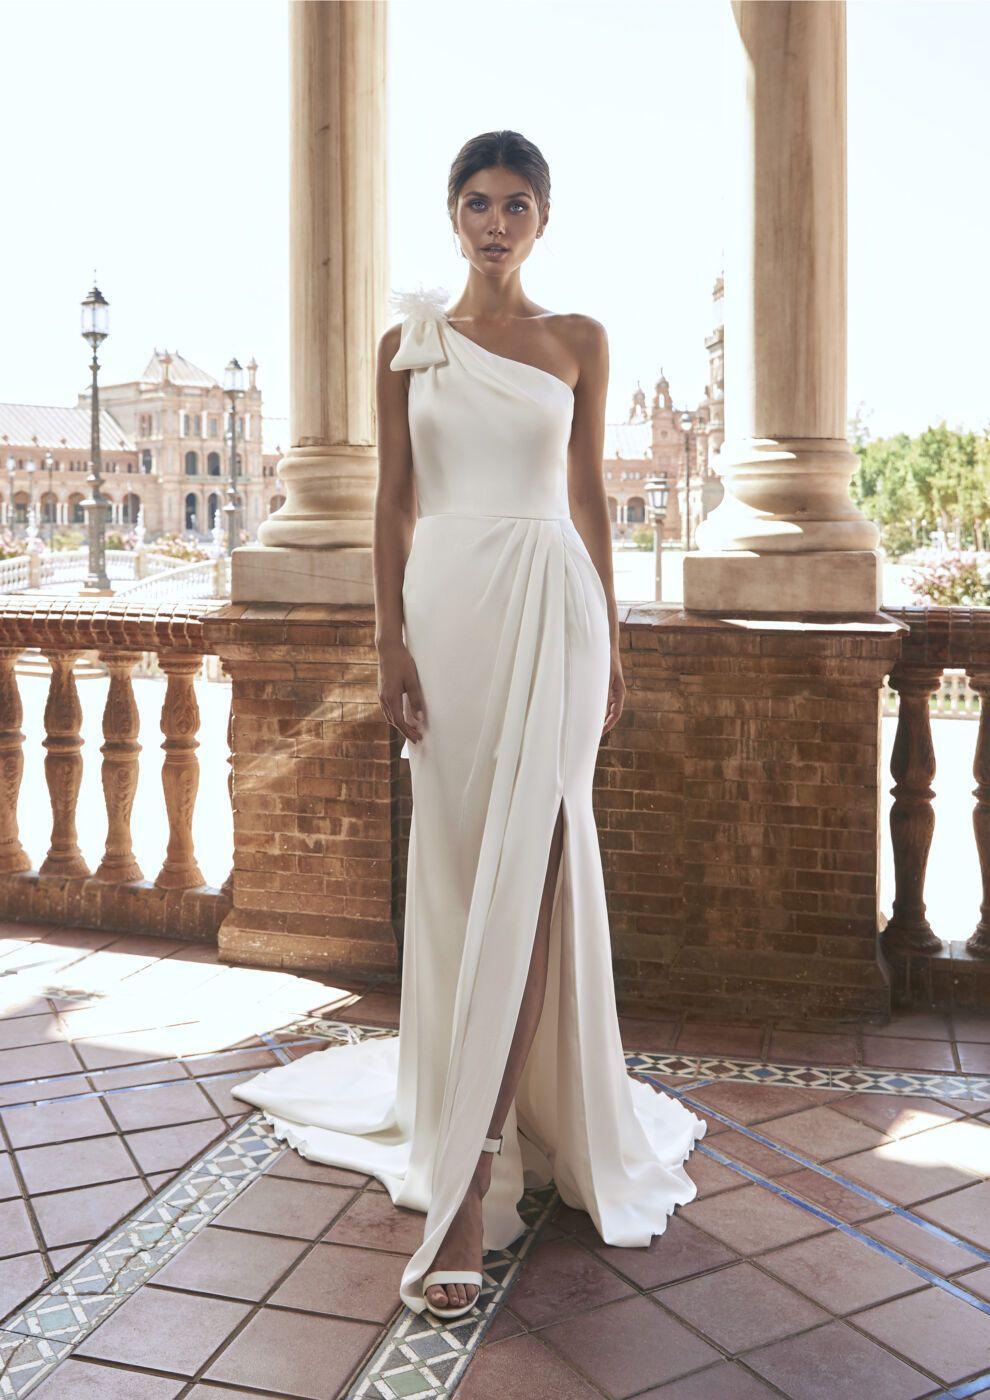 https://www.weddingmagazine.com.ua/wp-content/uploads/2021/03/bernarda-b.jpg